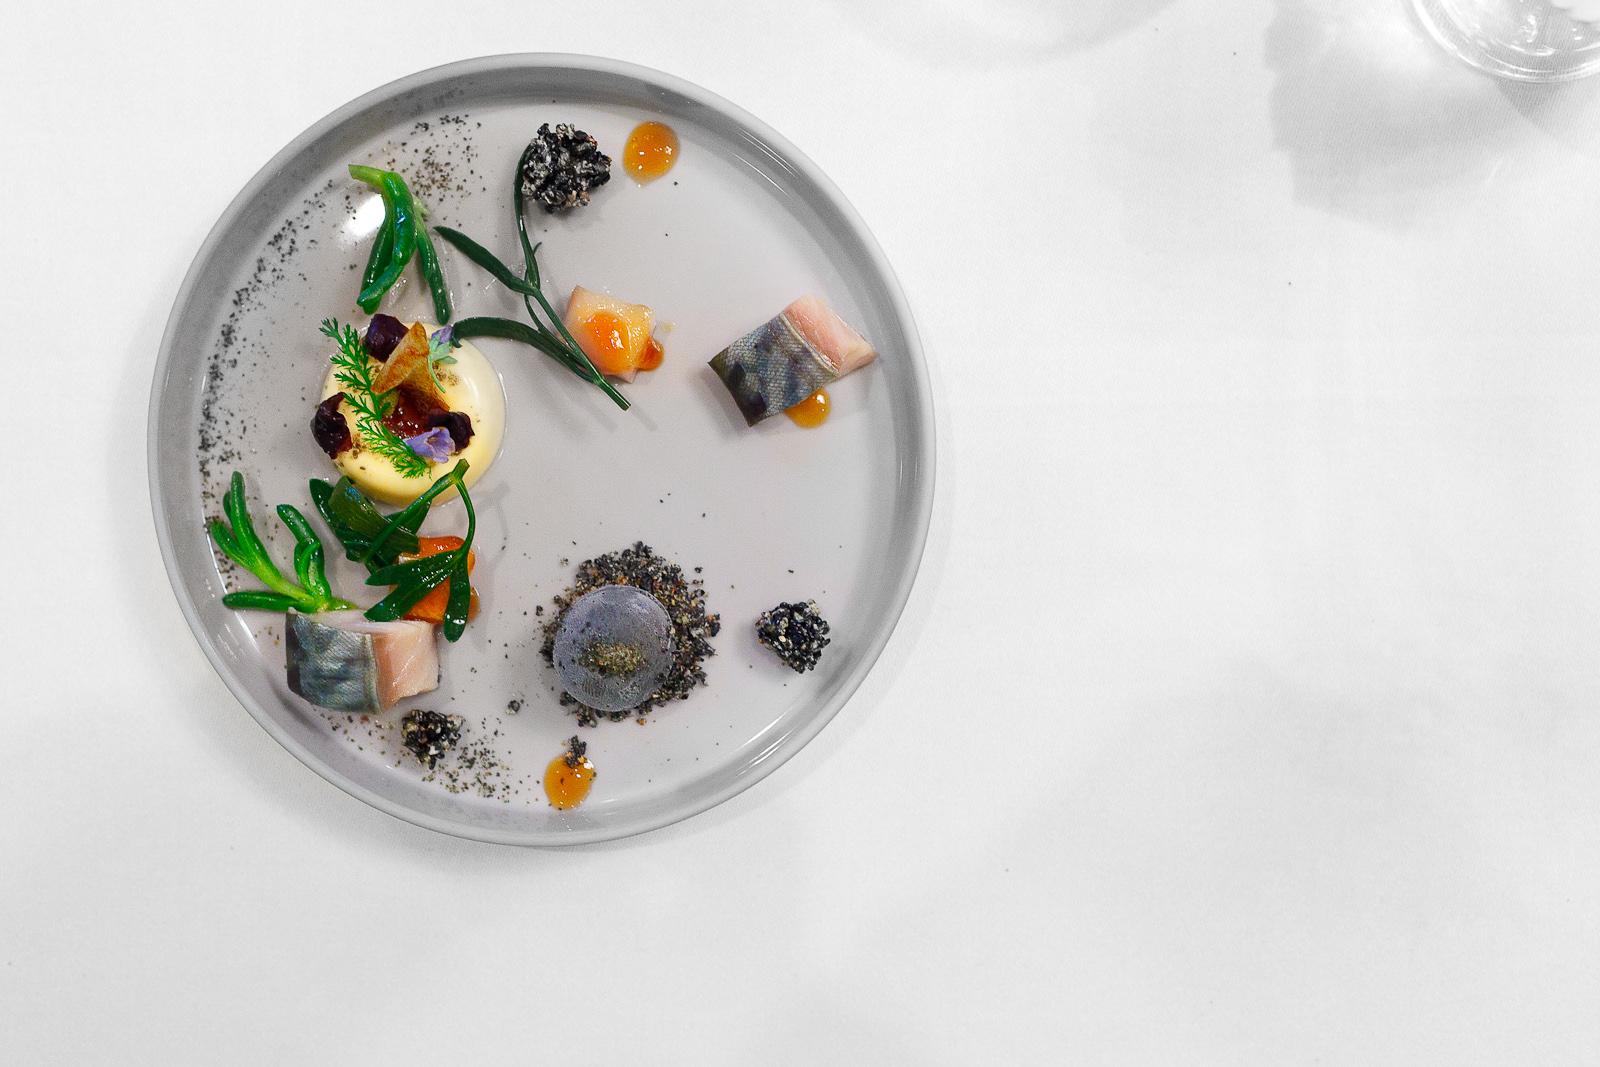 Amuse bouche: Marinated mackerel, passion fruit, and black sesame ice cream